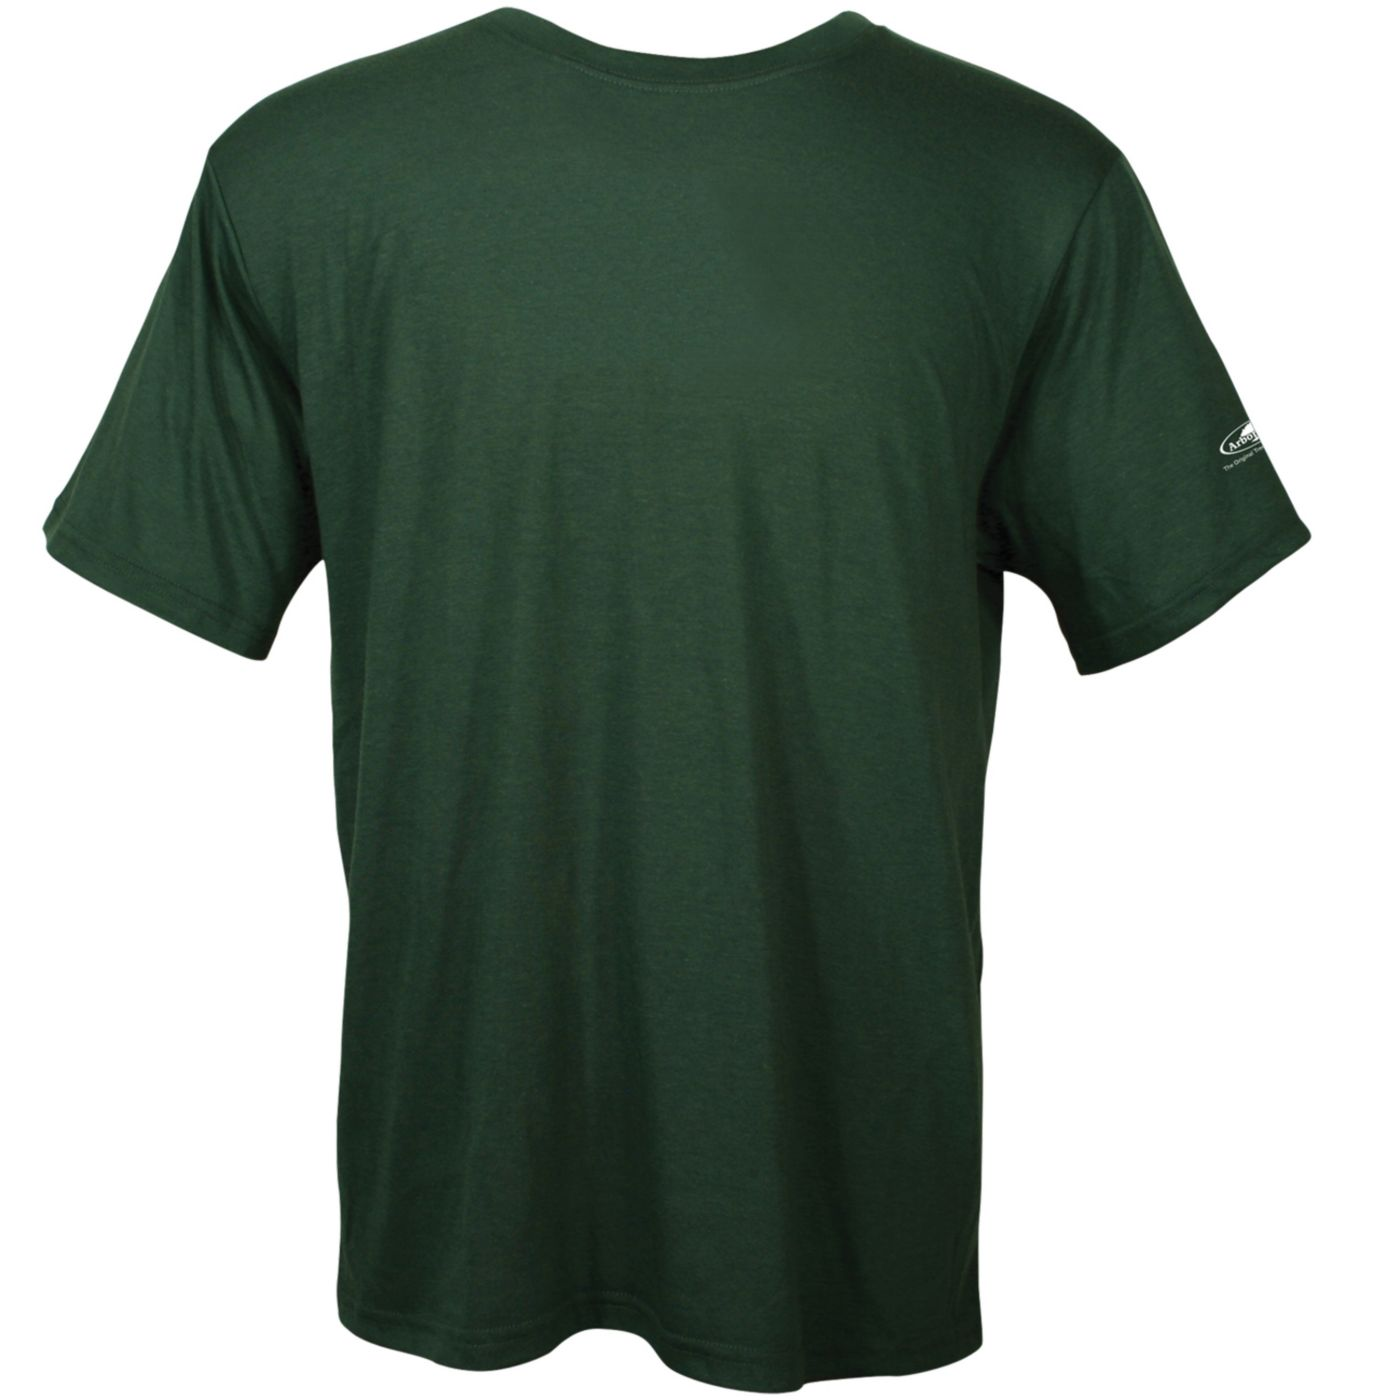 Arborwear Men's Tech T-Shirt